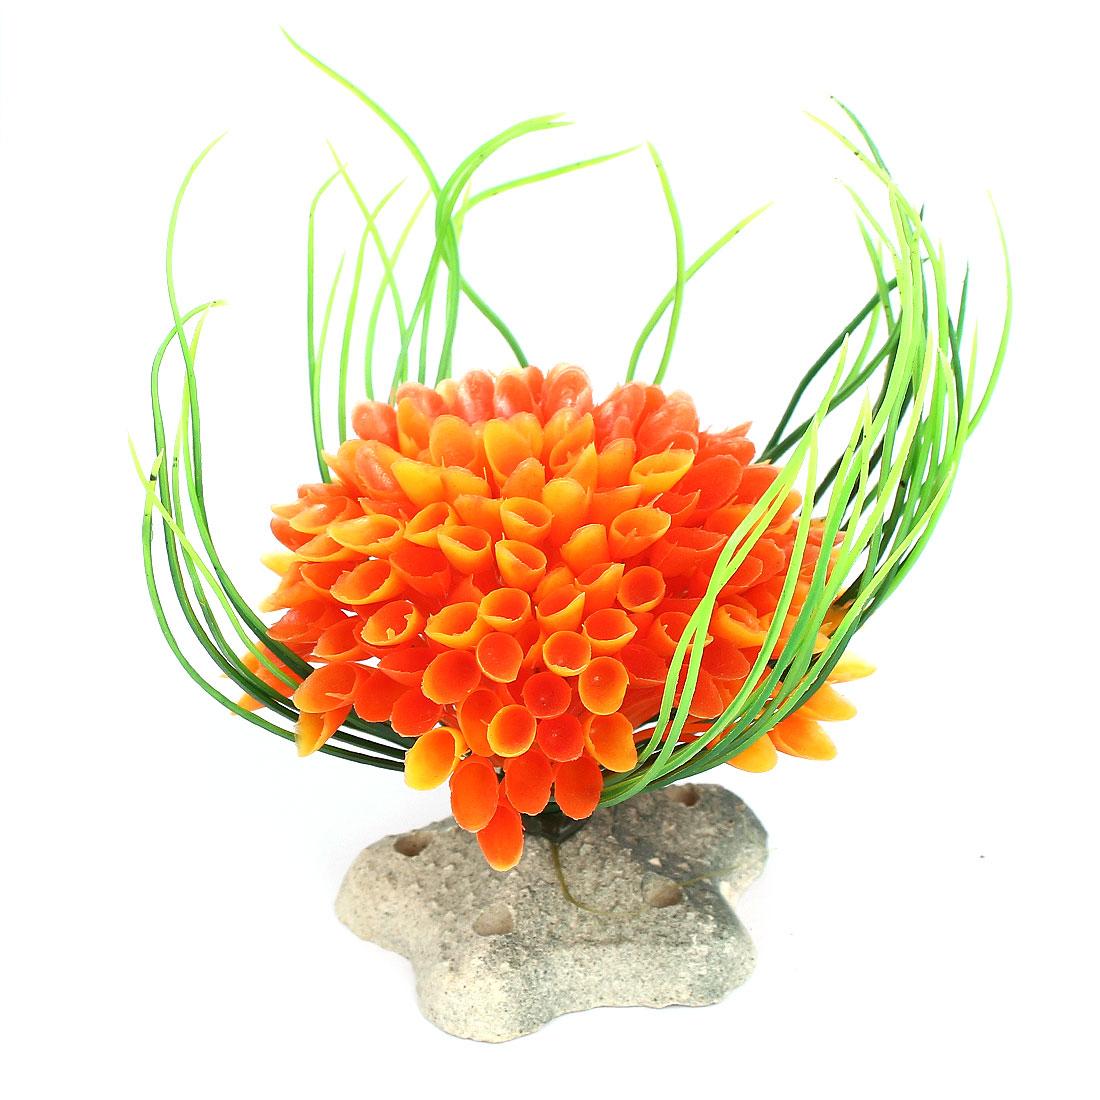 Aquarium Fish Tank Bowl Star Base Plastic Plant Bouquet Decor Ornament Orange